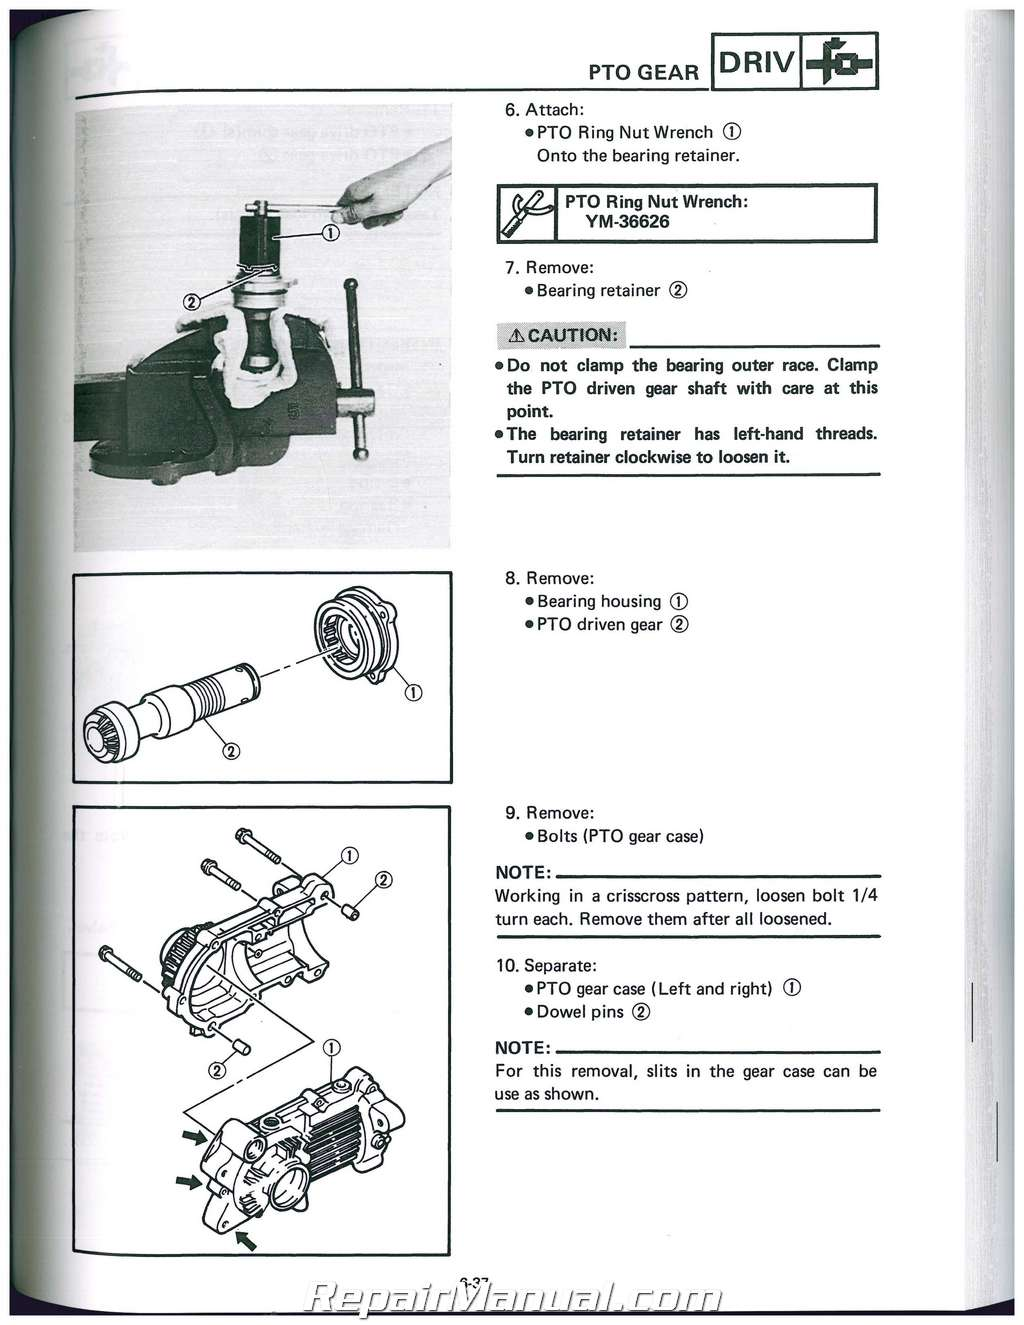 Yamaha Terrapro Manual - Open Source User Manual • on yamaha raptor wiring diagram, yamaha warrior wiring diagram, yamaha big bear wiring diagram, yamaha wolverine wiring diagram, yamaha bruin wiring diagram, yamaha moto 4 wiring diagram, yamaha kodiak wiring diagram, yamaha blaster wiring diagram, yamaha banshee wiring diagram, yamaha breeze wiring diagram,